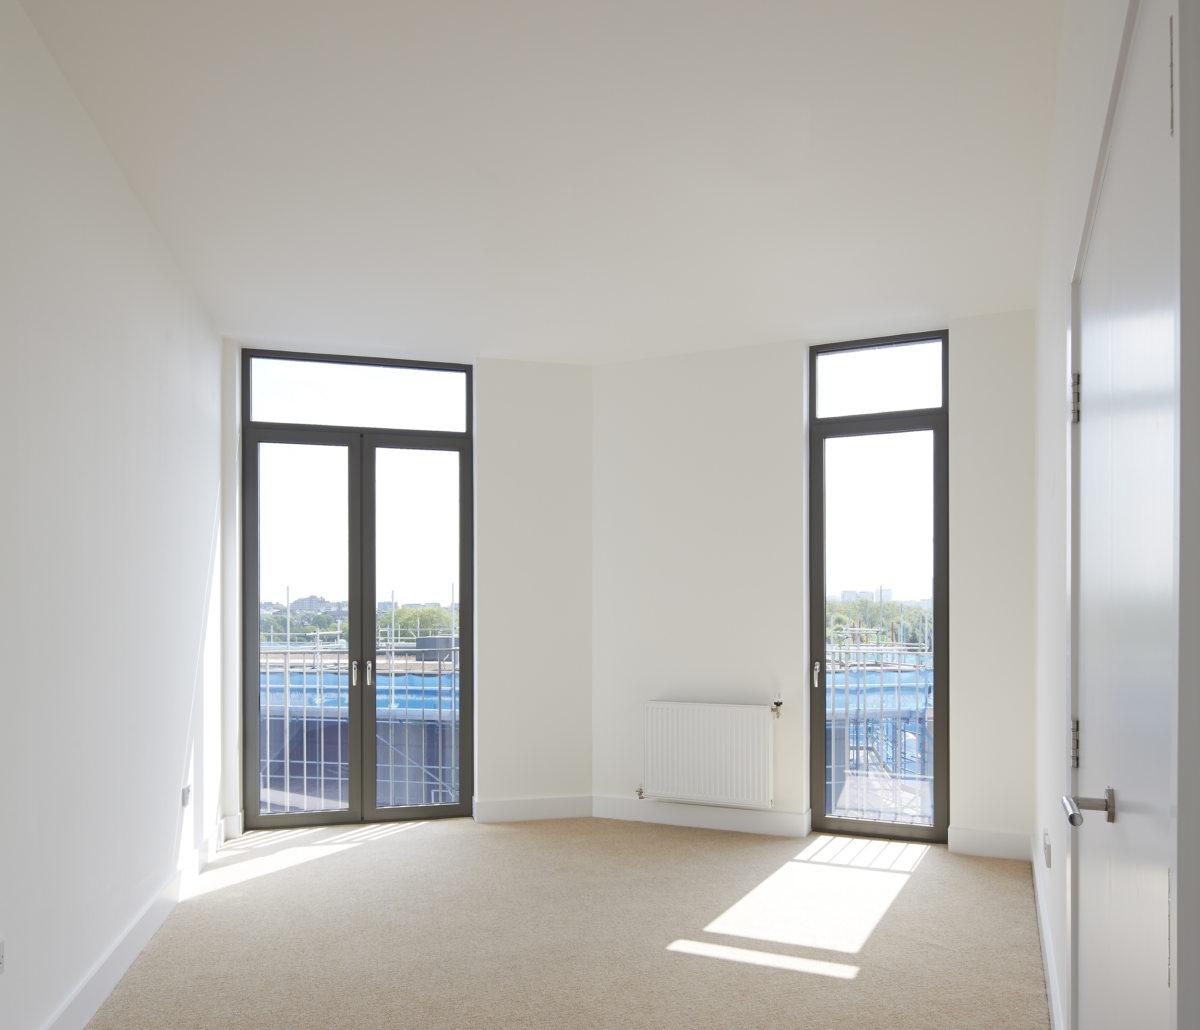 Alison Brooks Architects _ South Kilburn Estate Regeneration _ Bronte and Fielding _ Photo Interior Bedroom